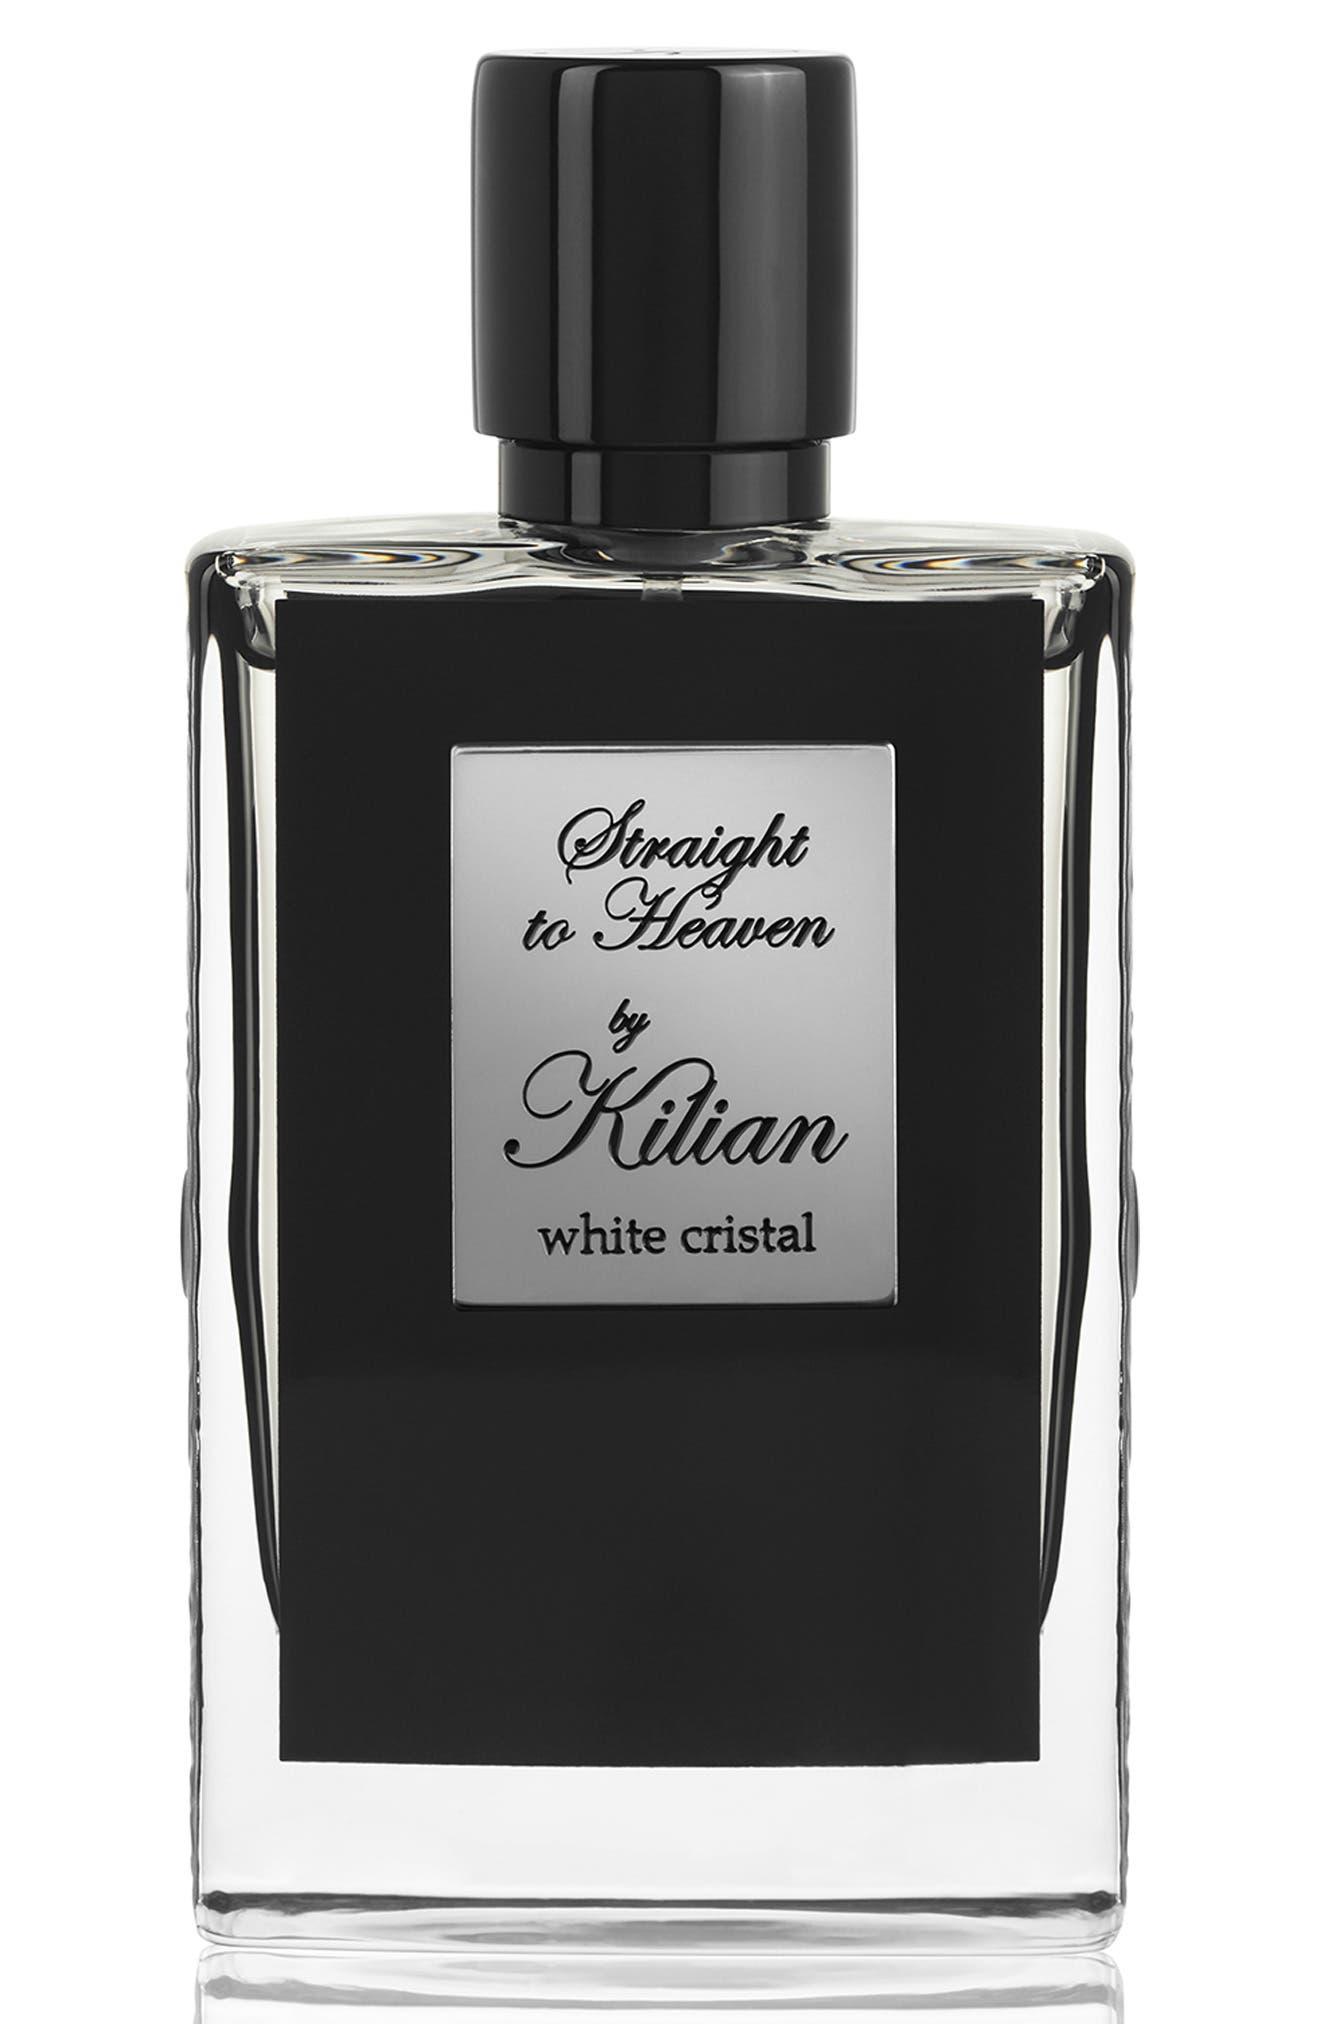 KILIAN, 'L'Oeuvre Noire - Straight to Heaven, white cristal' Refillable Fragrance Spray, Main thumbnail 1, color, NO COLOR